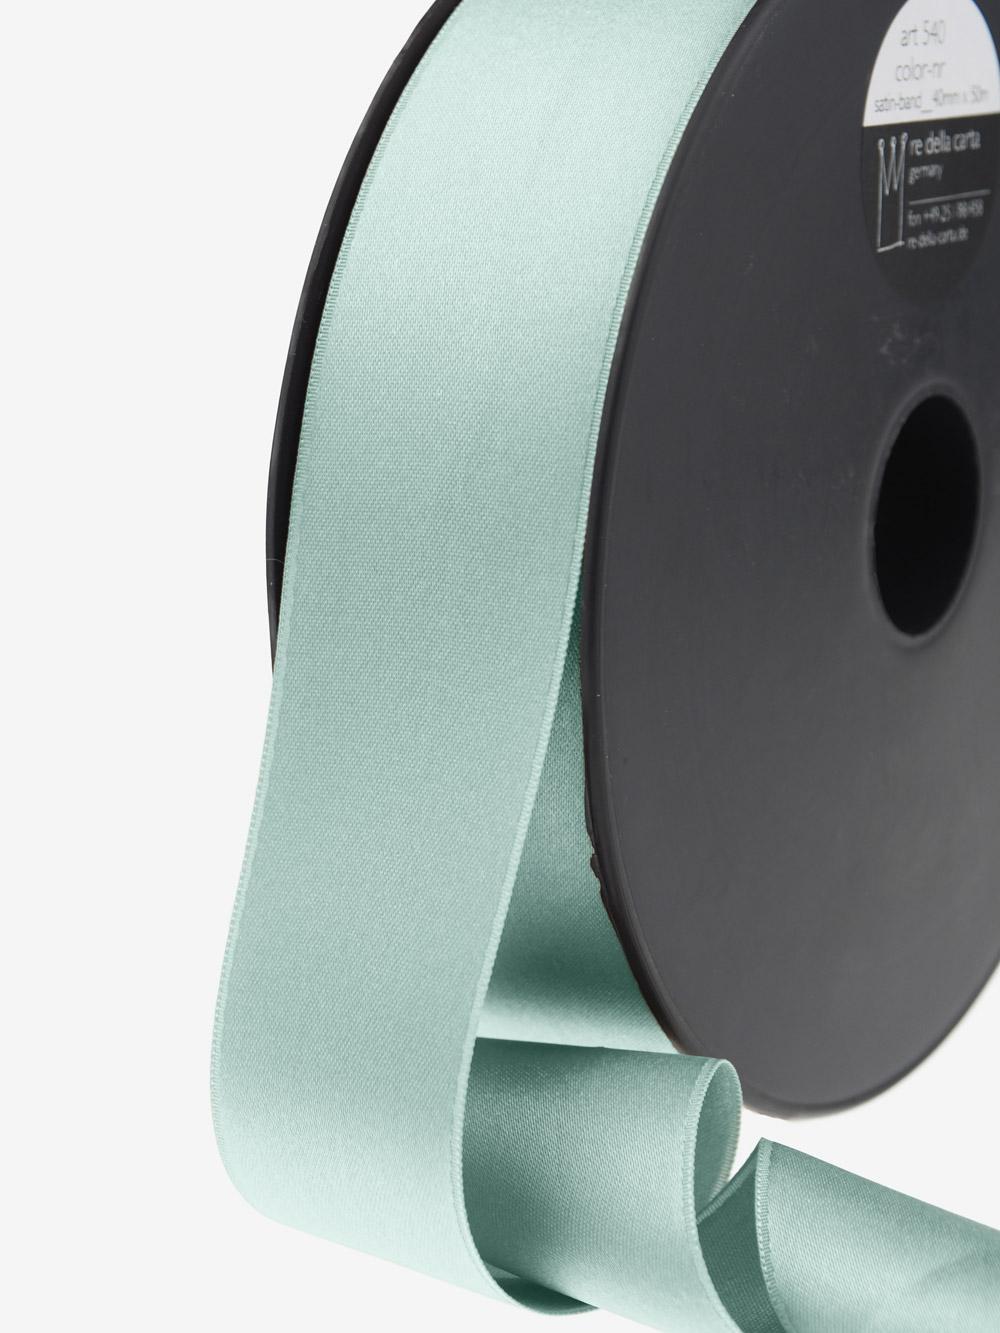 satinband-gewebt-mintgruen-breit-hochwertig